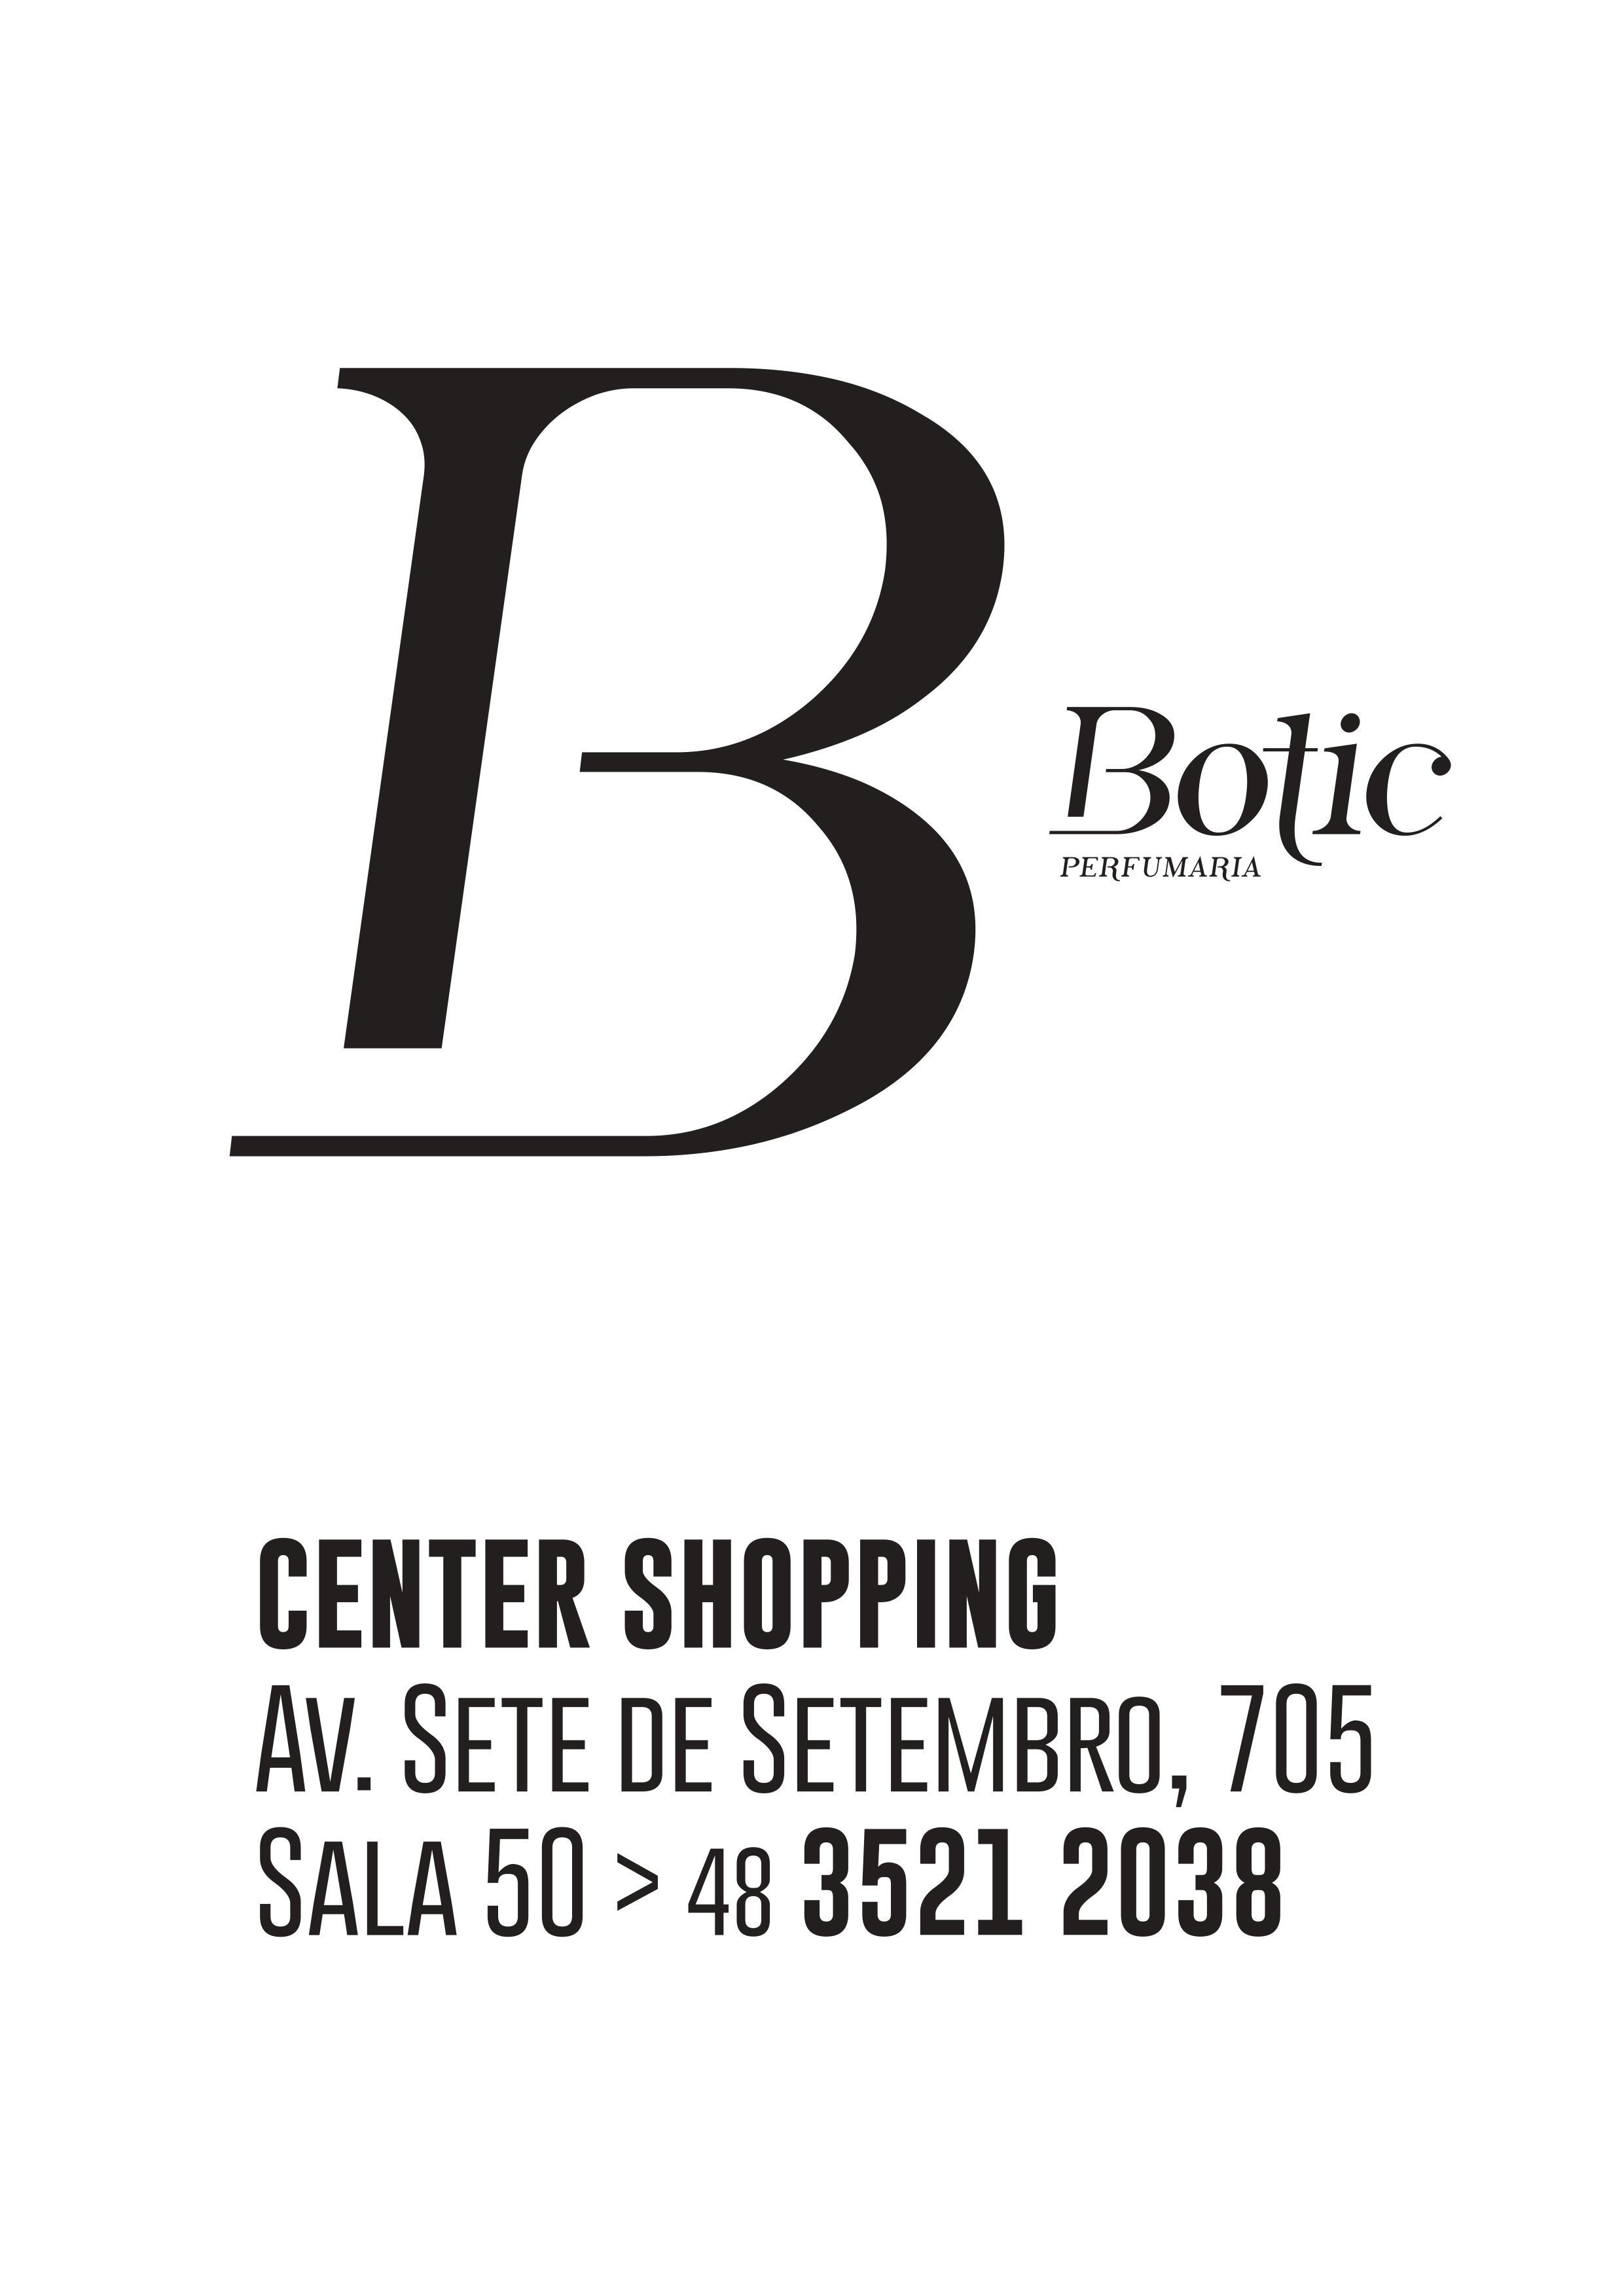 Botic Perfumaria